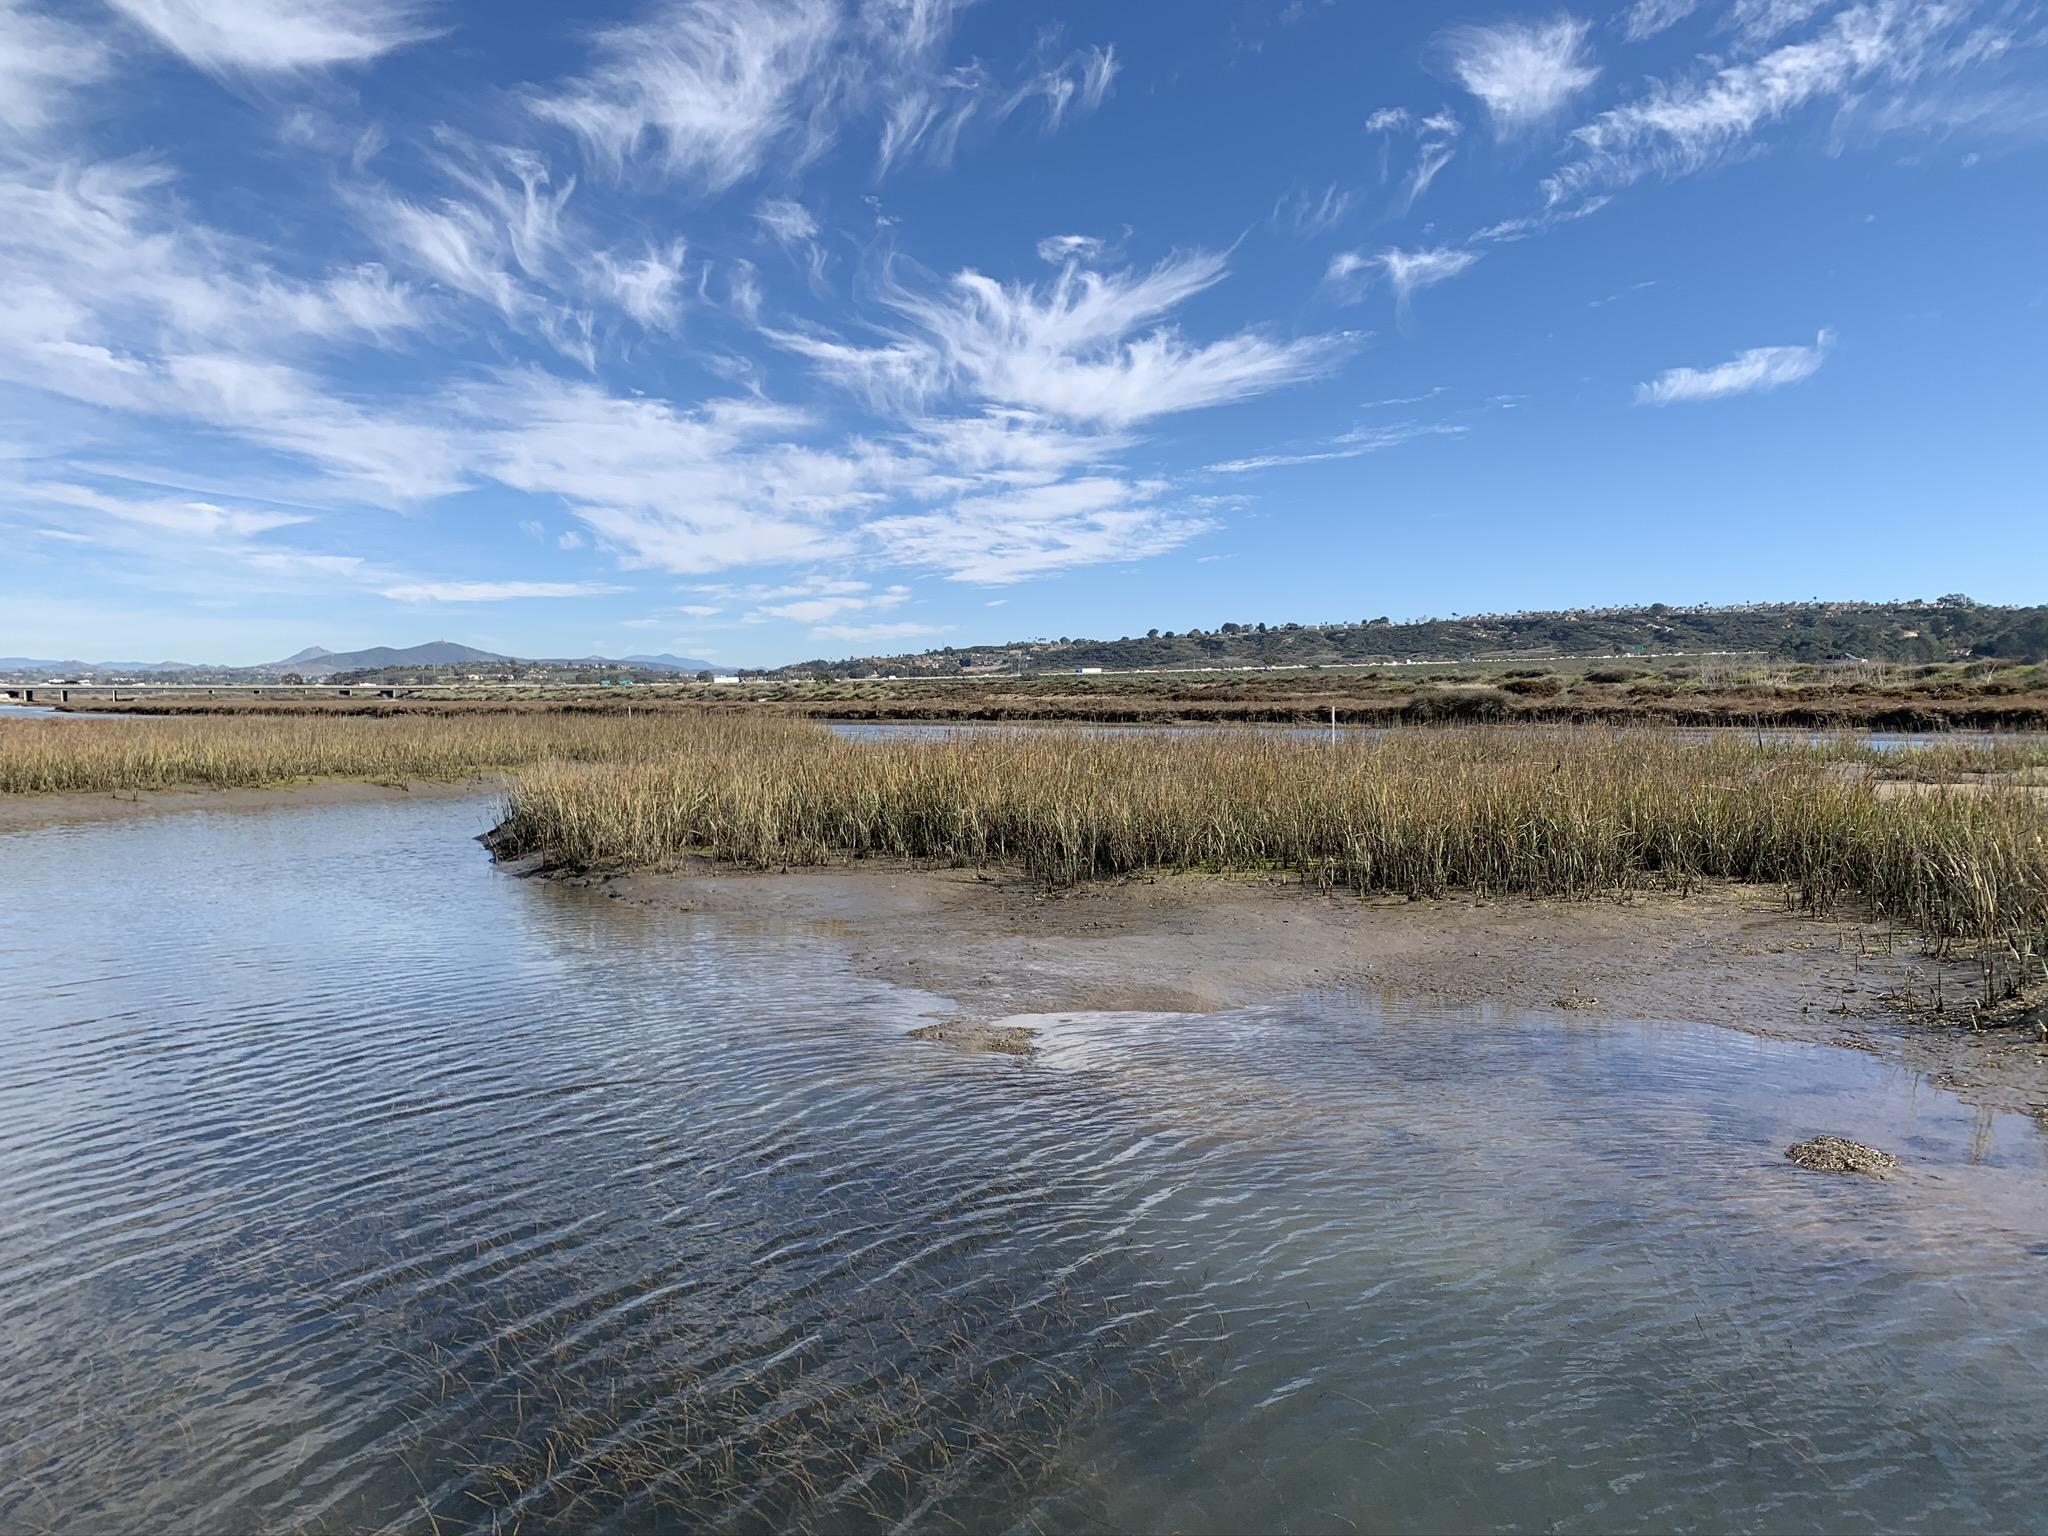 San Dieguito Lagoon - after